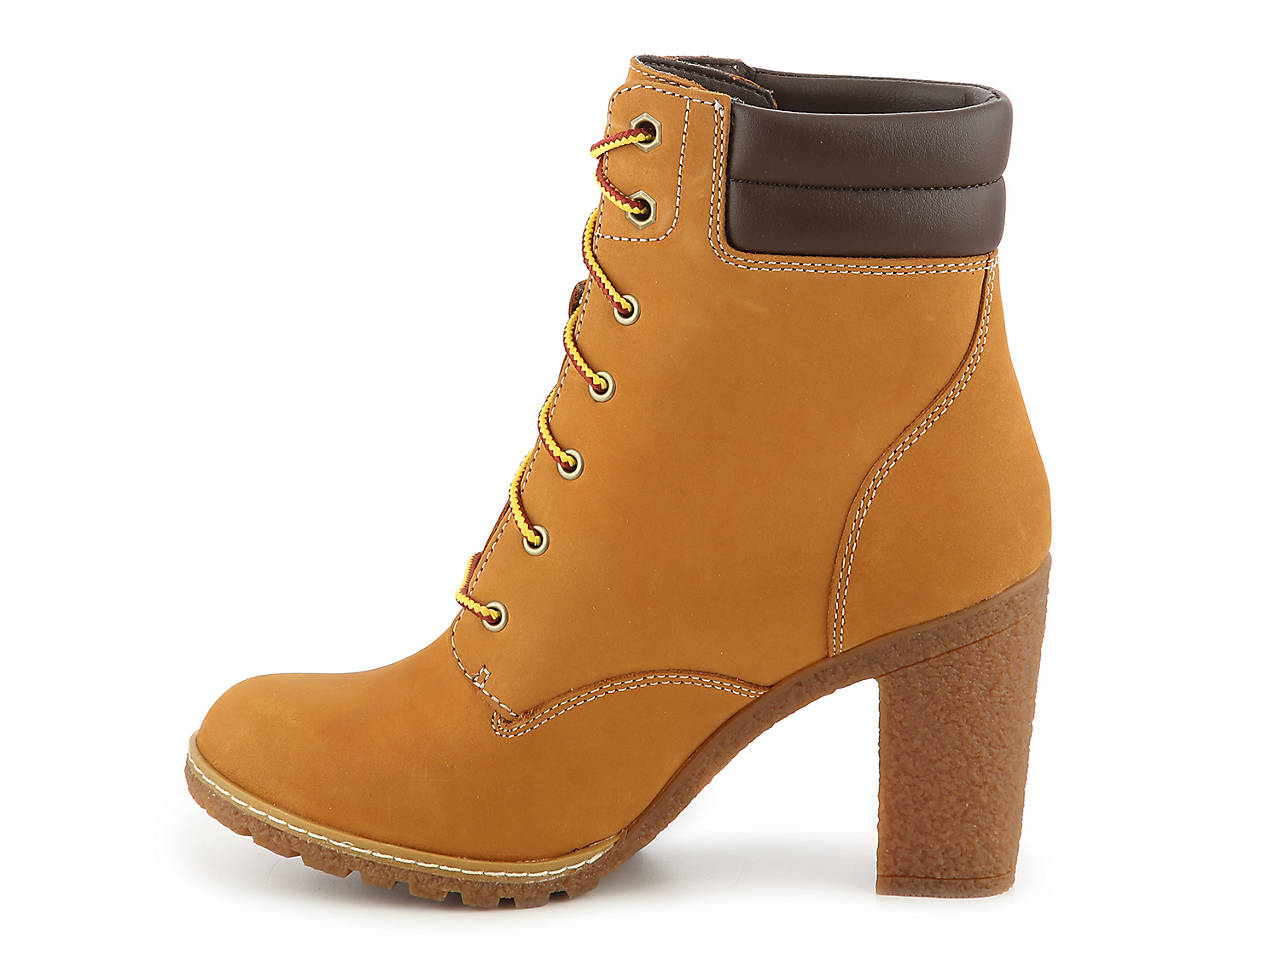 Timberland Tillston Combat Boot Women's Shoes | DSW